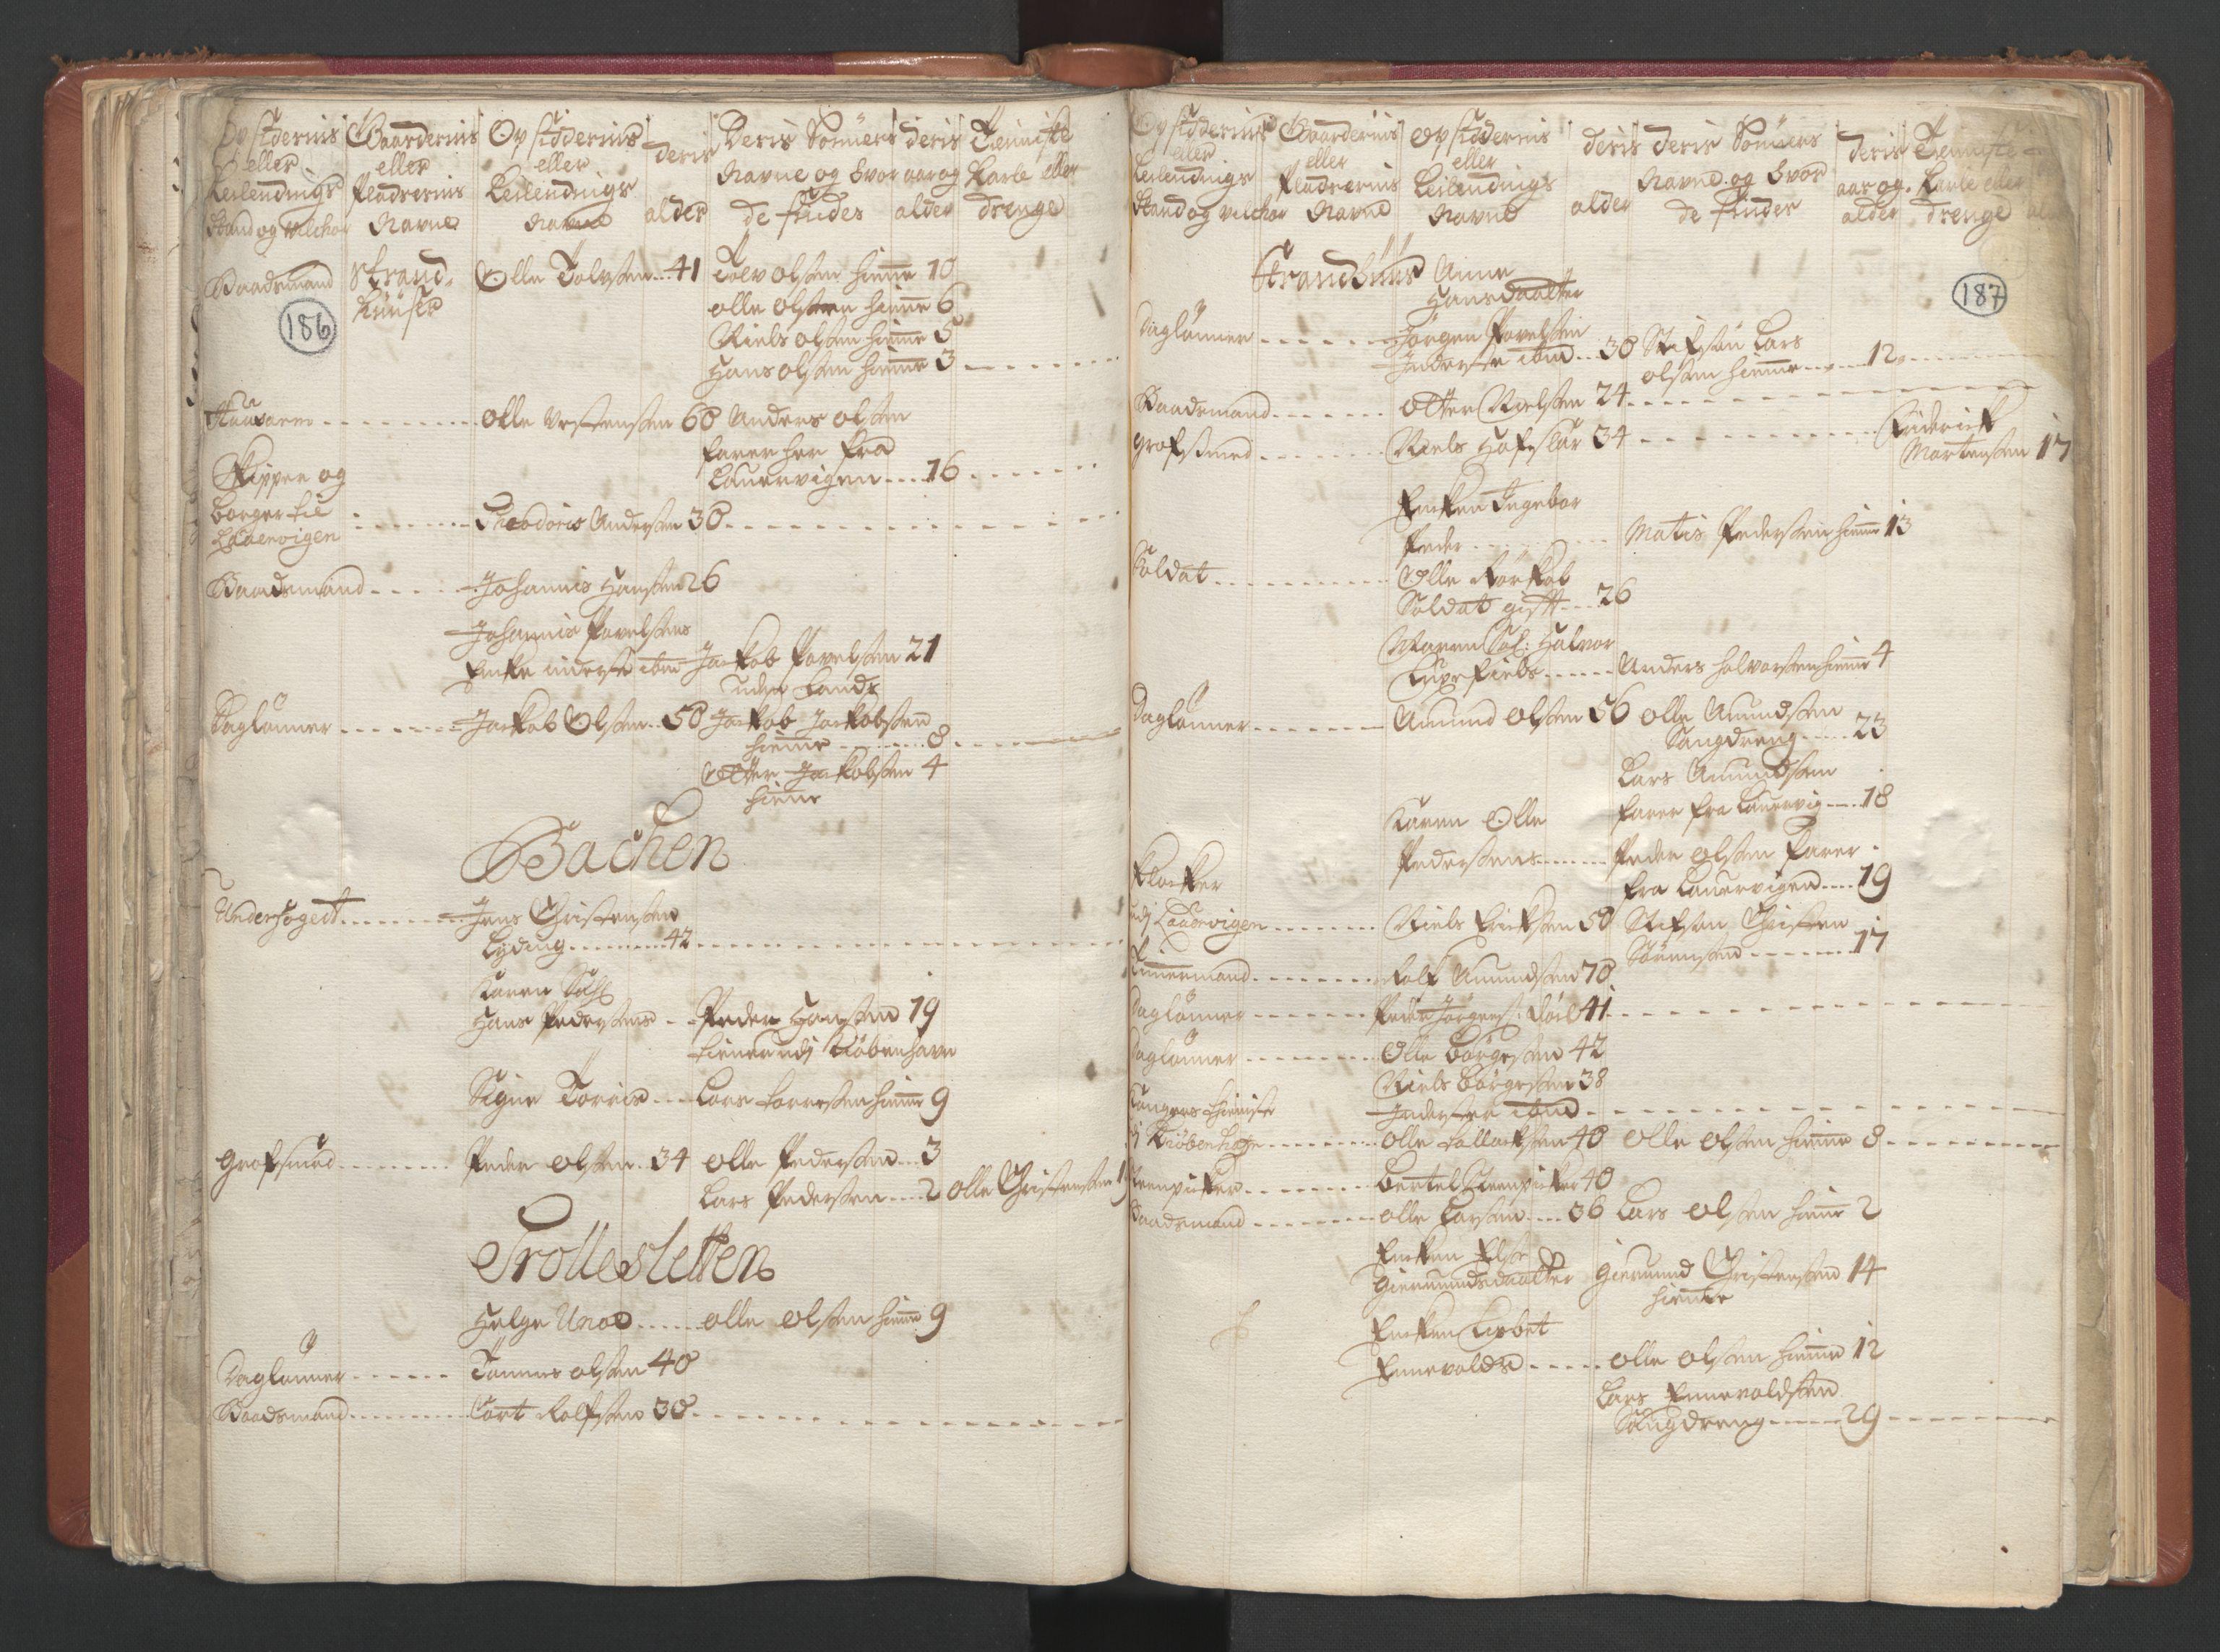 RA, Manntallet 1701, nr. 2: Solør, Odal og Østerdal fogderi og Larvik grevskap, 1701, s. 186-187